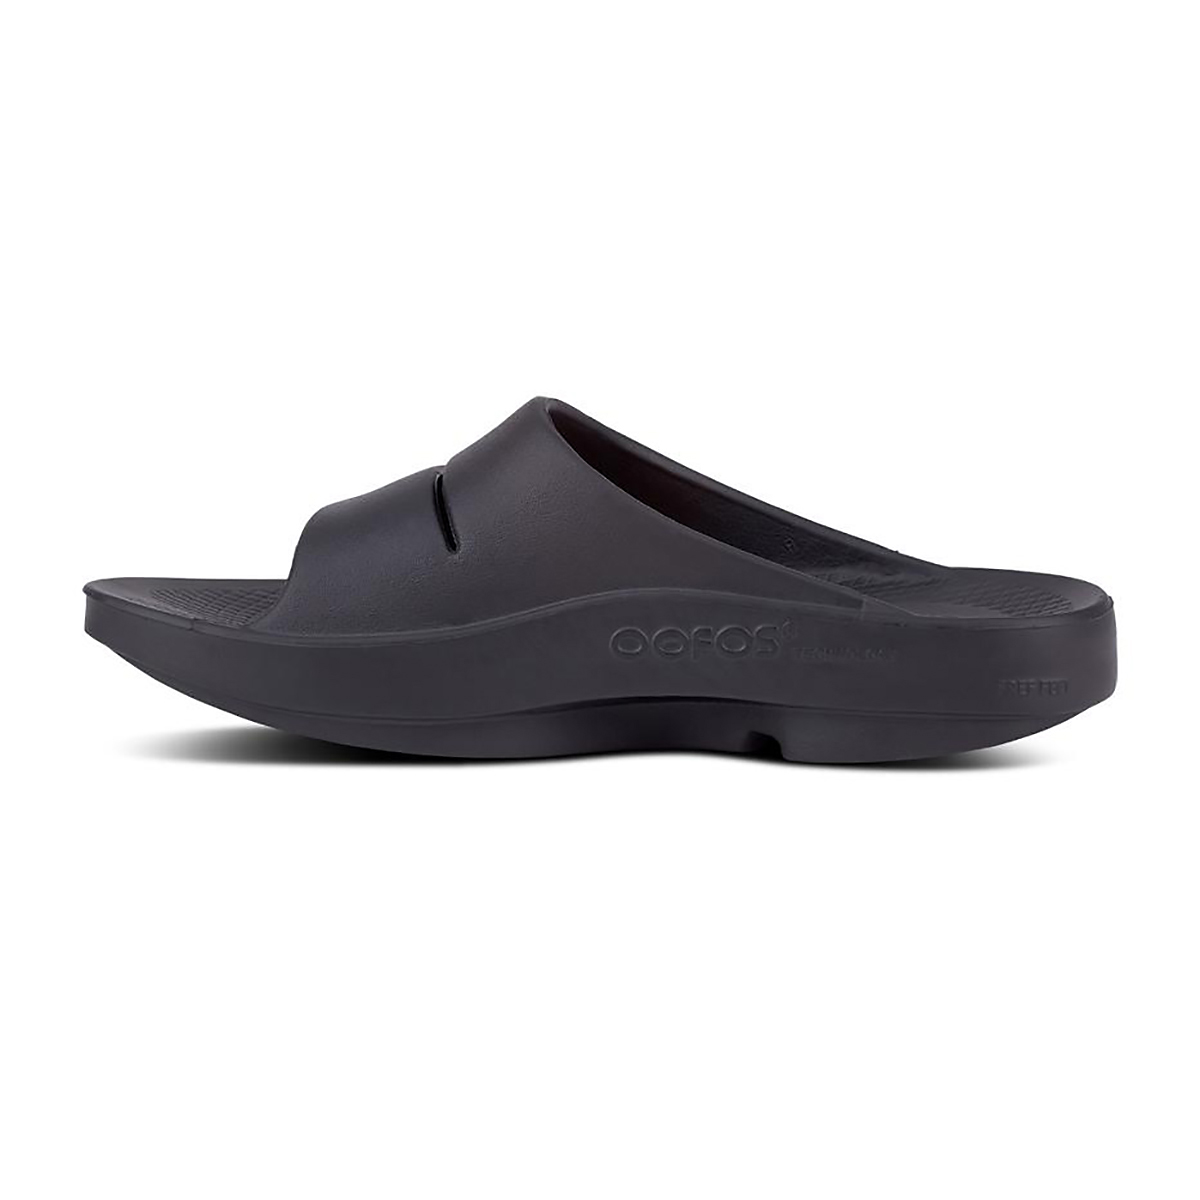 Oofos OOahh Recovery Slide - Color: Black - Size: M7/W9 - Width: Regular, Black, large, image 2